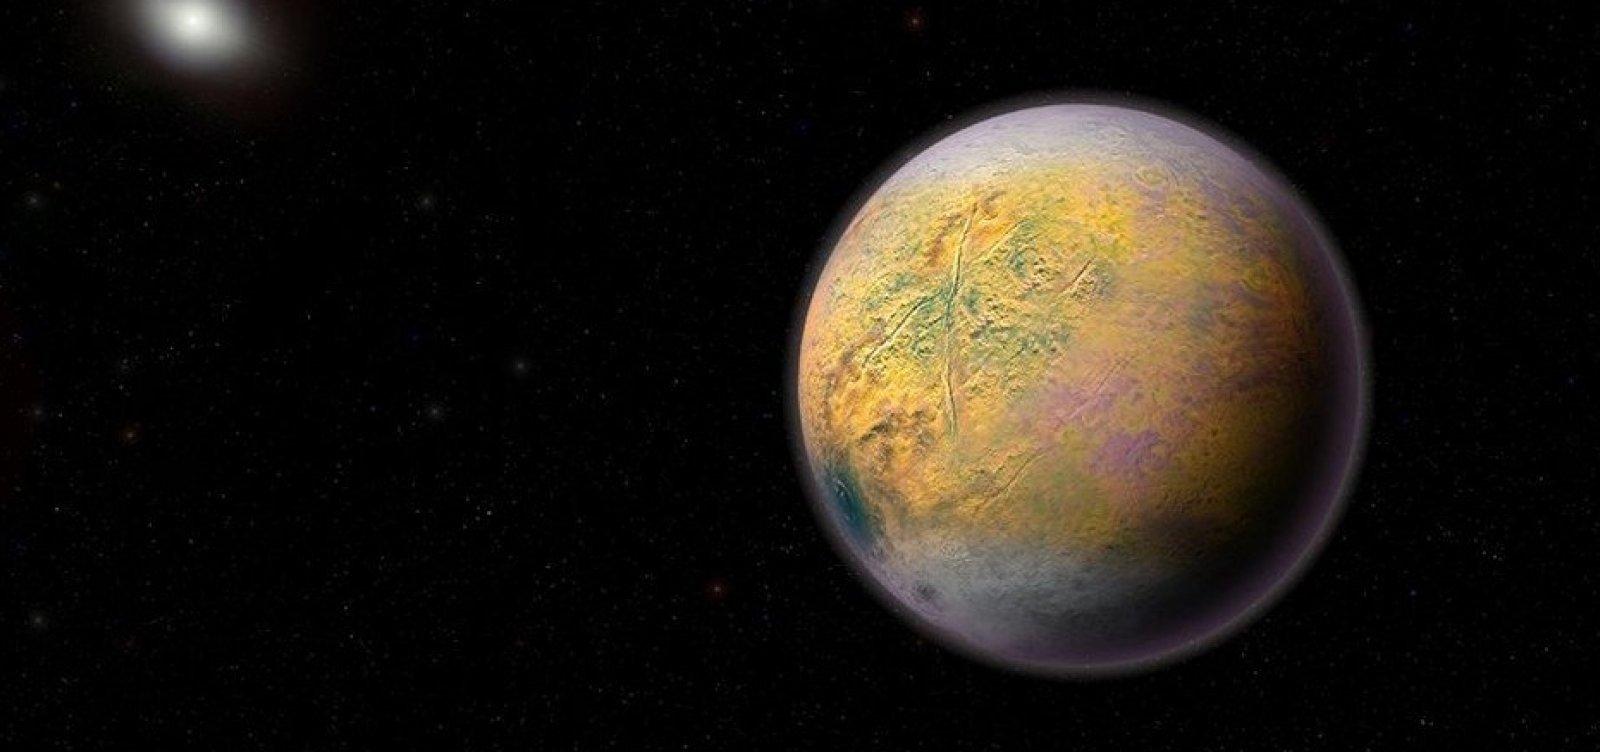 Objeto descoberto nos confins do Sistema Solar aponta para existência de nono planeta